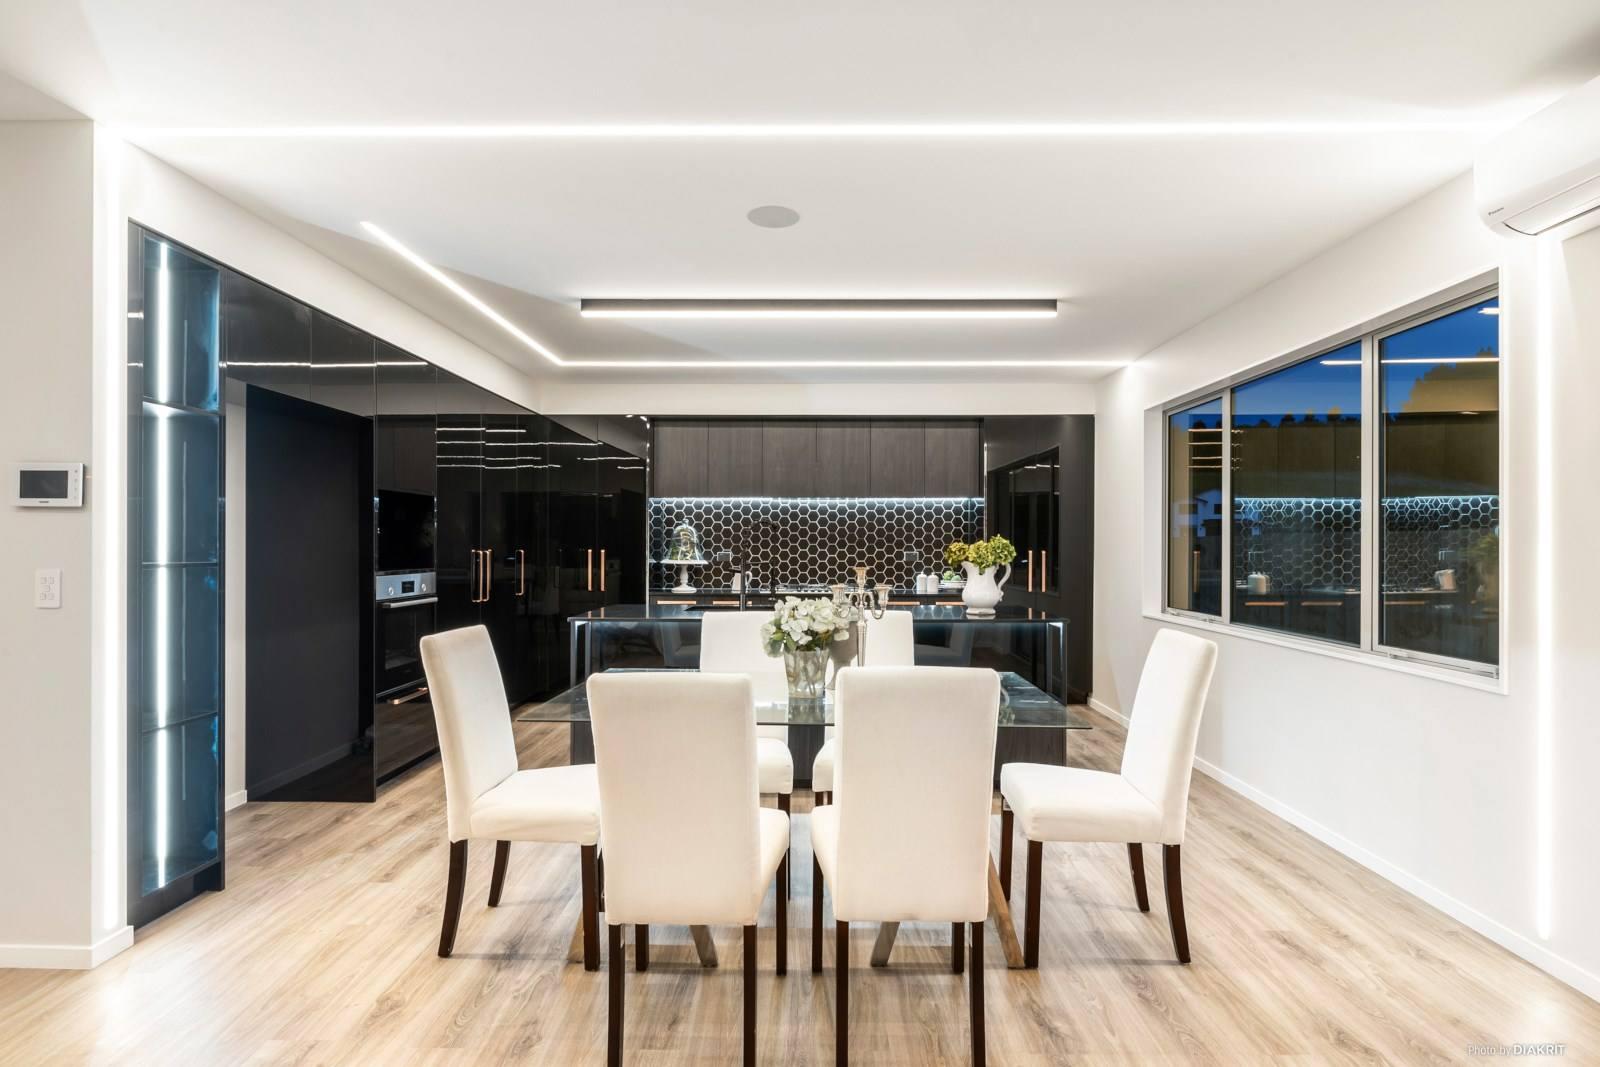 Orewa 5房 全新智能精装美墅 打破空间局限 周边绿意环绕 10年质保在手 即刻享受美好生活! Stunning Brand New Home